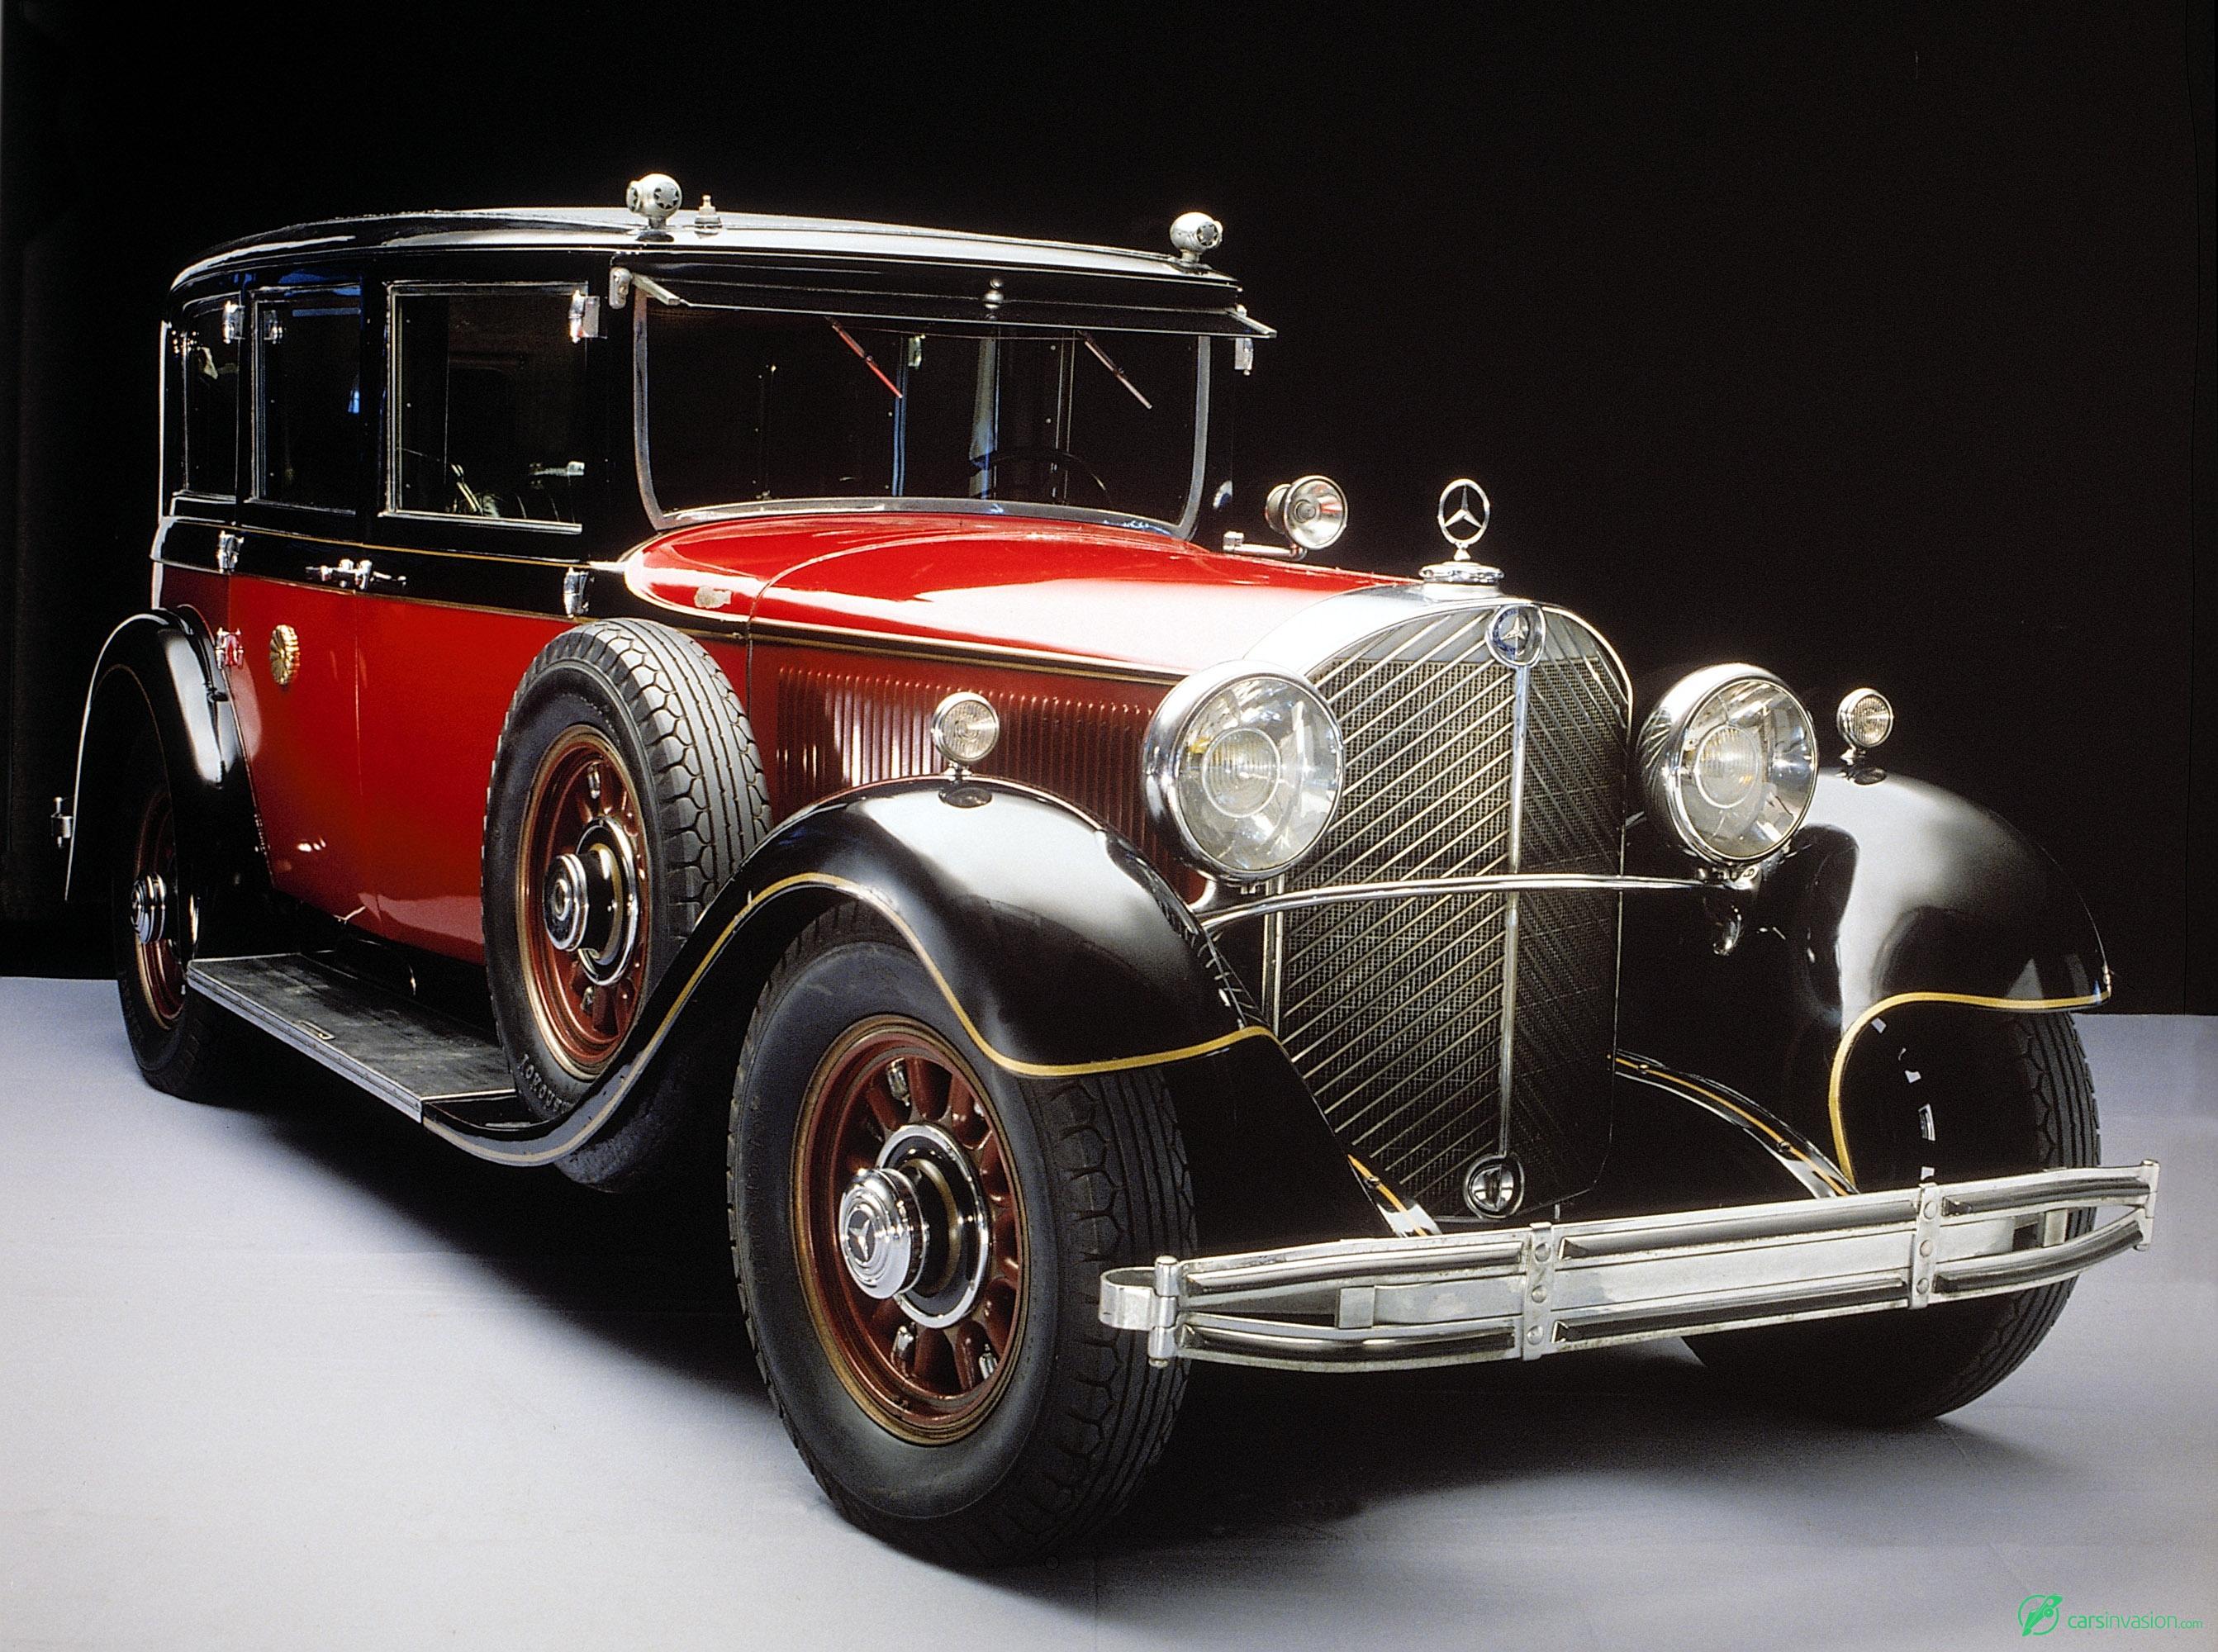 1930 Mercedes-Benz 770 Grand Mercedes - HD Pictures ...